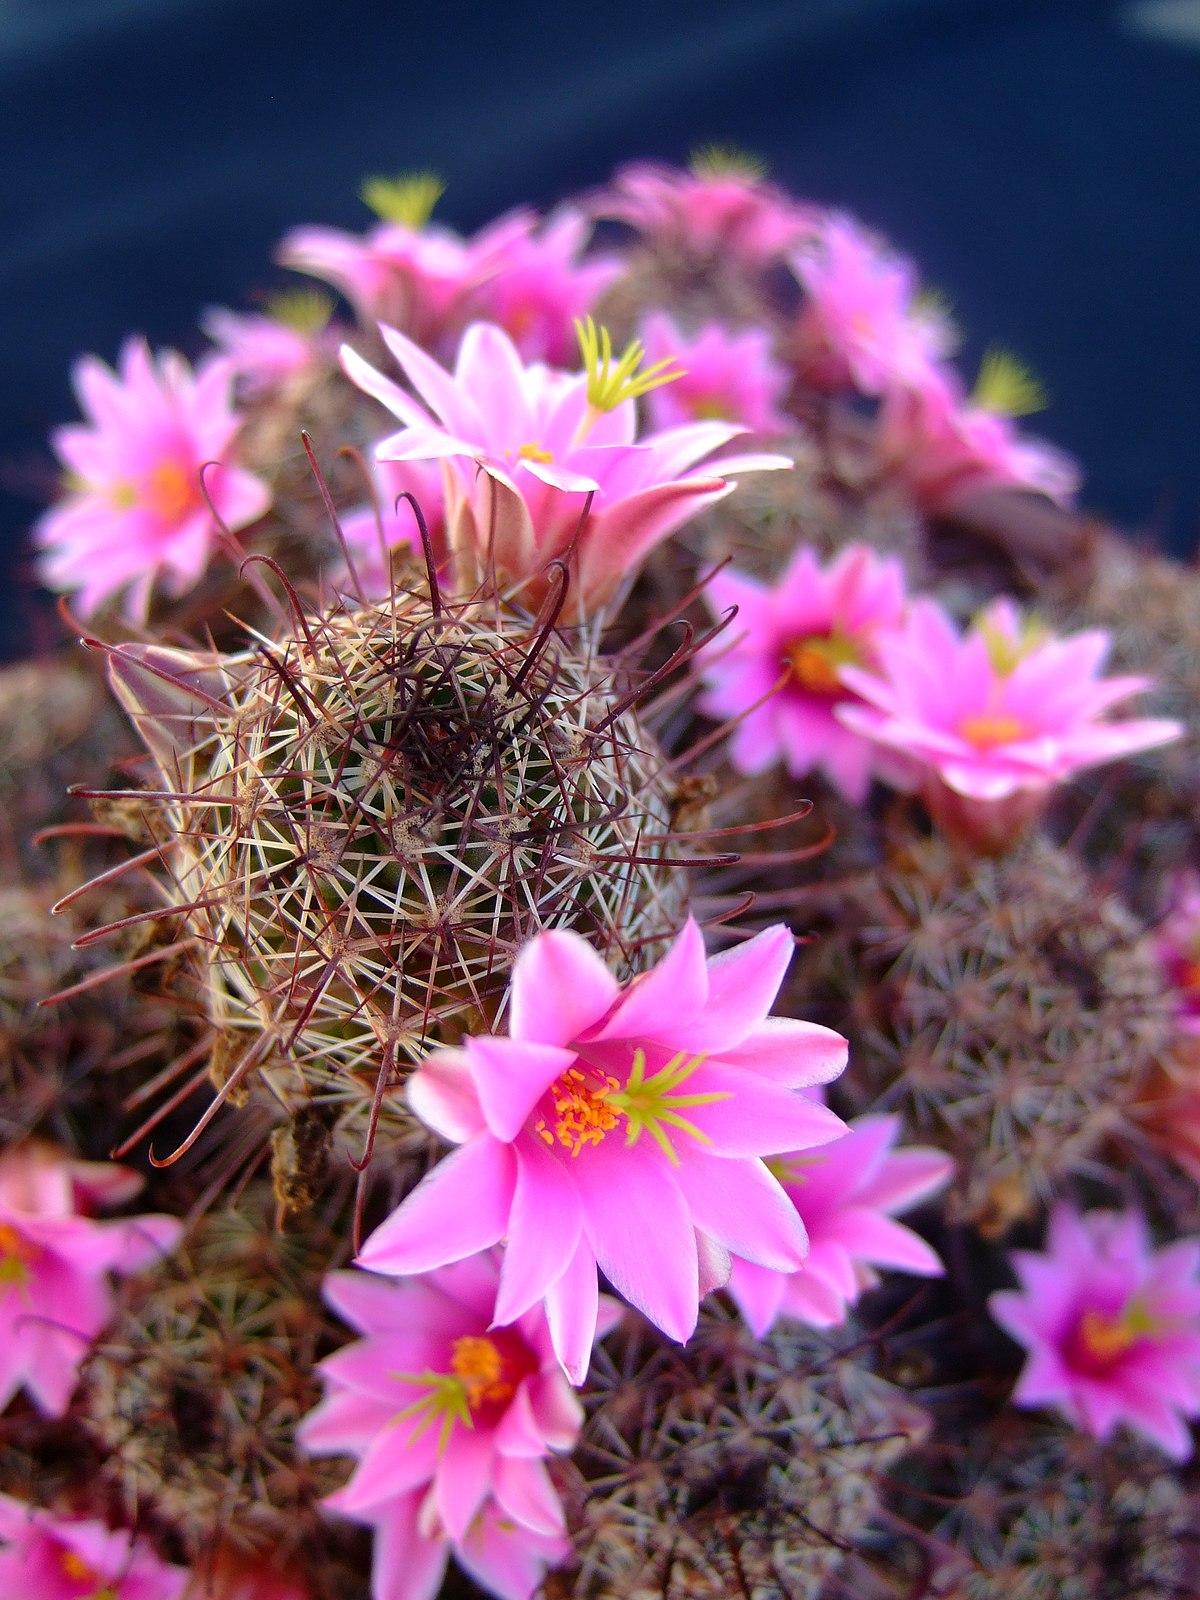 Mammillaria wikipedia la enciclopedia libre for Cactus variedades